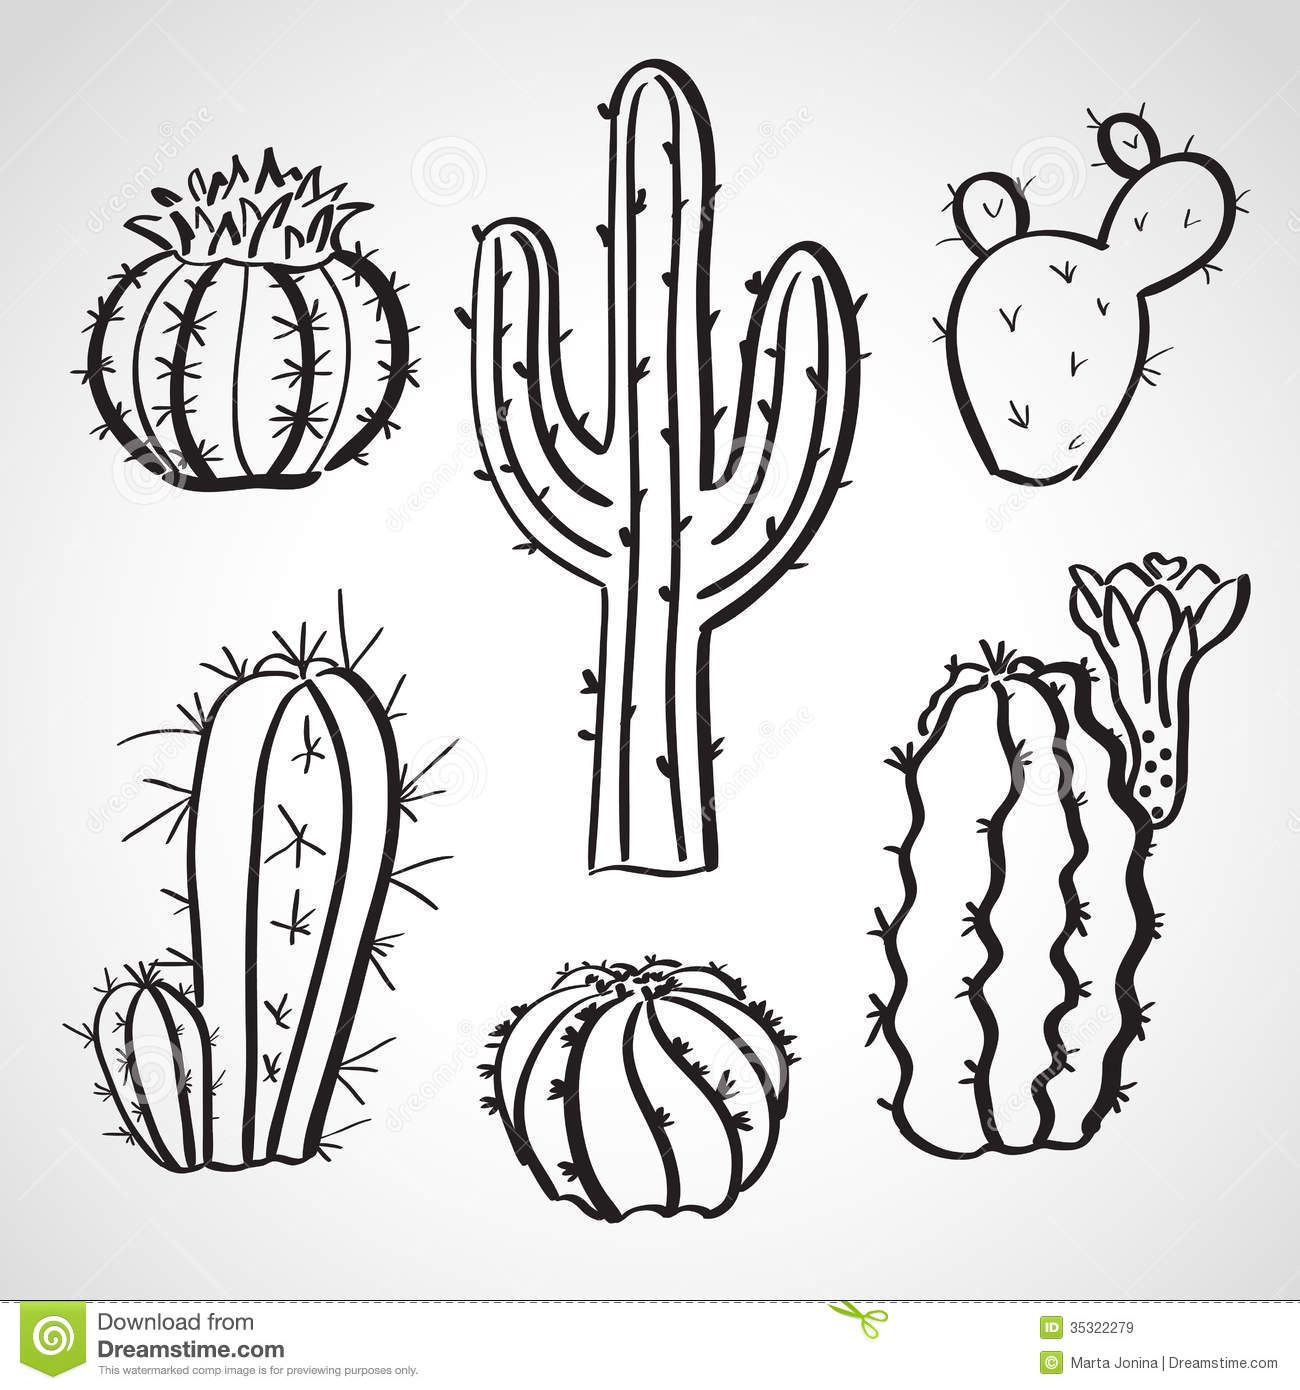 Ink style hand drawn sketch set - cactus set.   Cactus ...  Cactus Flower Outline